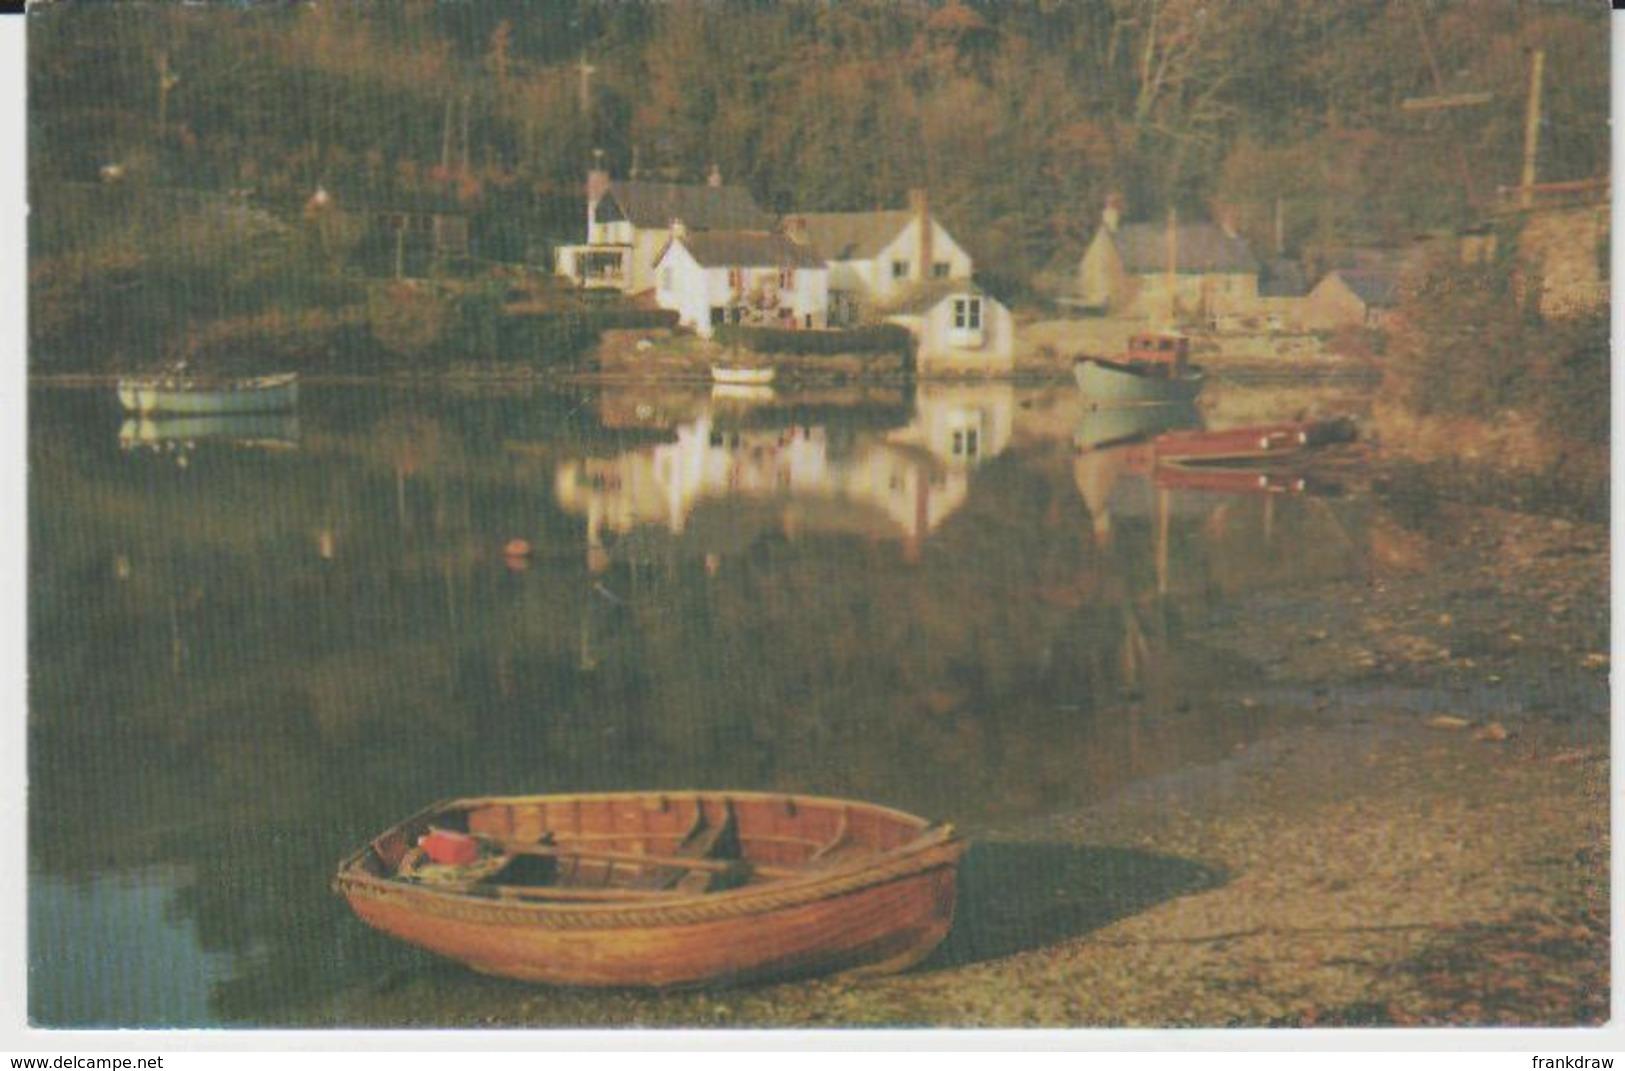 Postcard - Bridge End, Noss Mayo, Devon - Unused Very Good - Cartes Postales